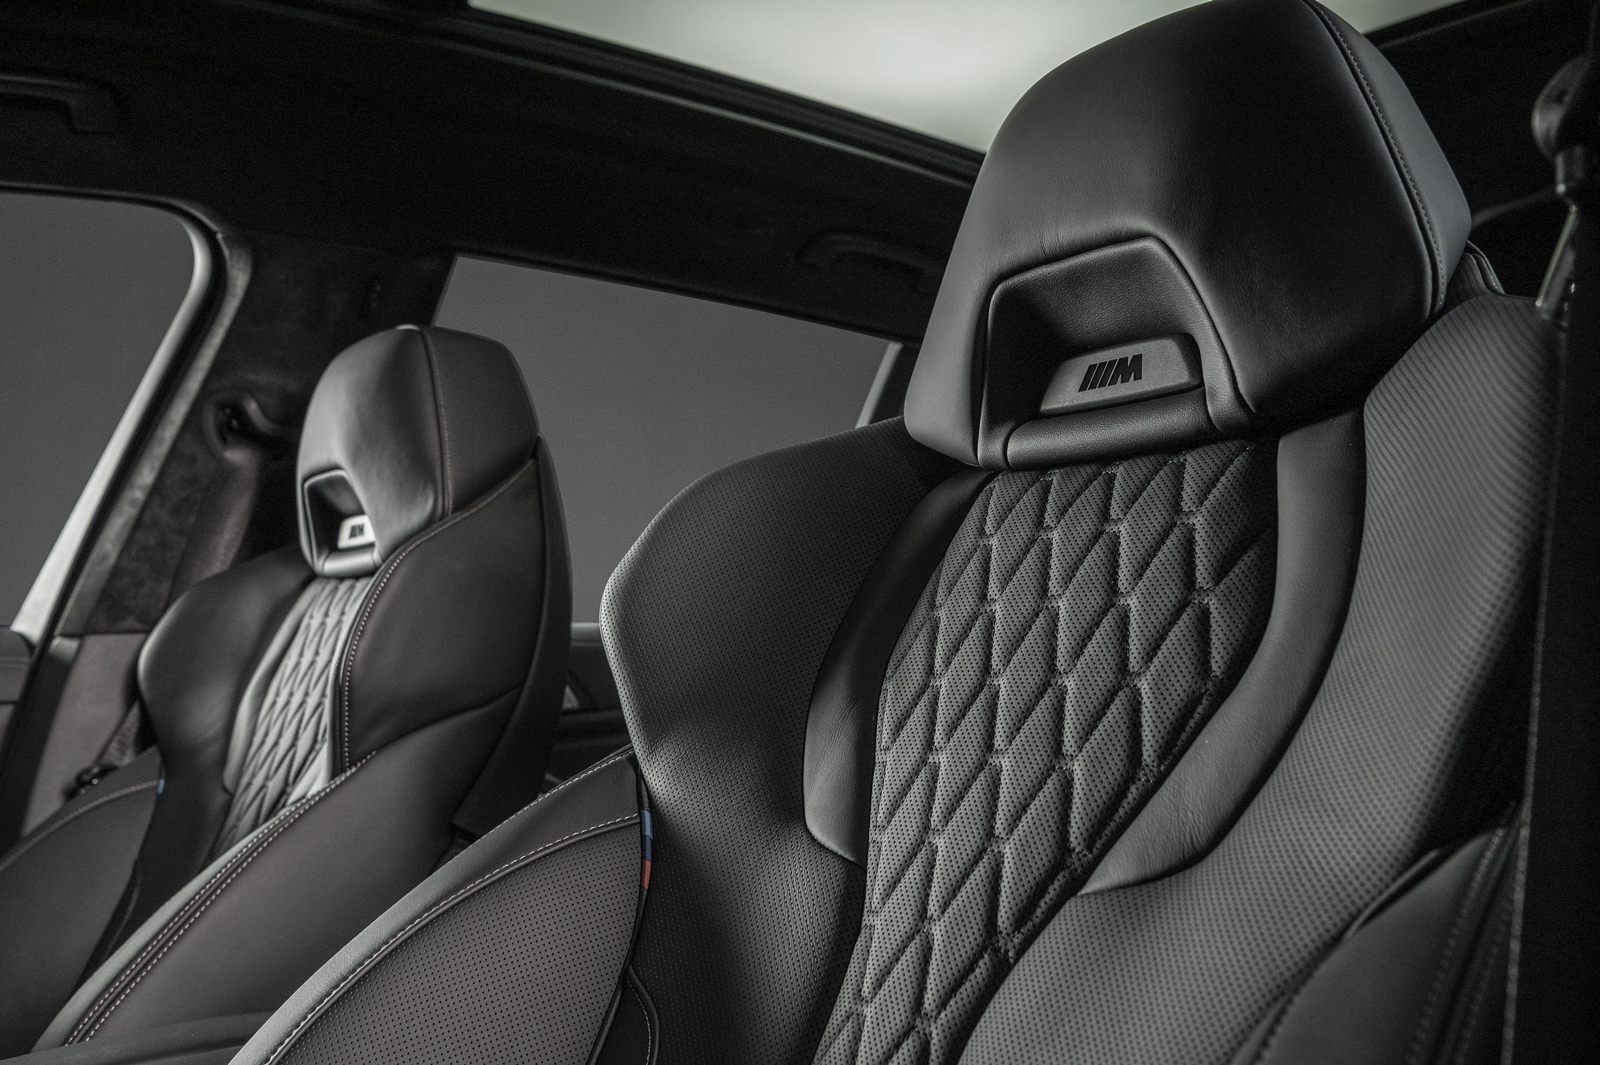 BMW X7 Dark Knight曜黑版配備 Vernasca真皮內裝與 M 雙前座跑車座椅。